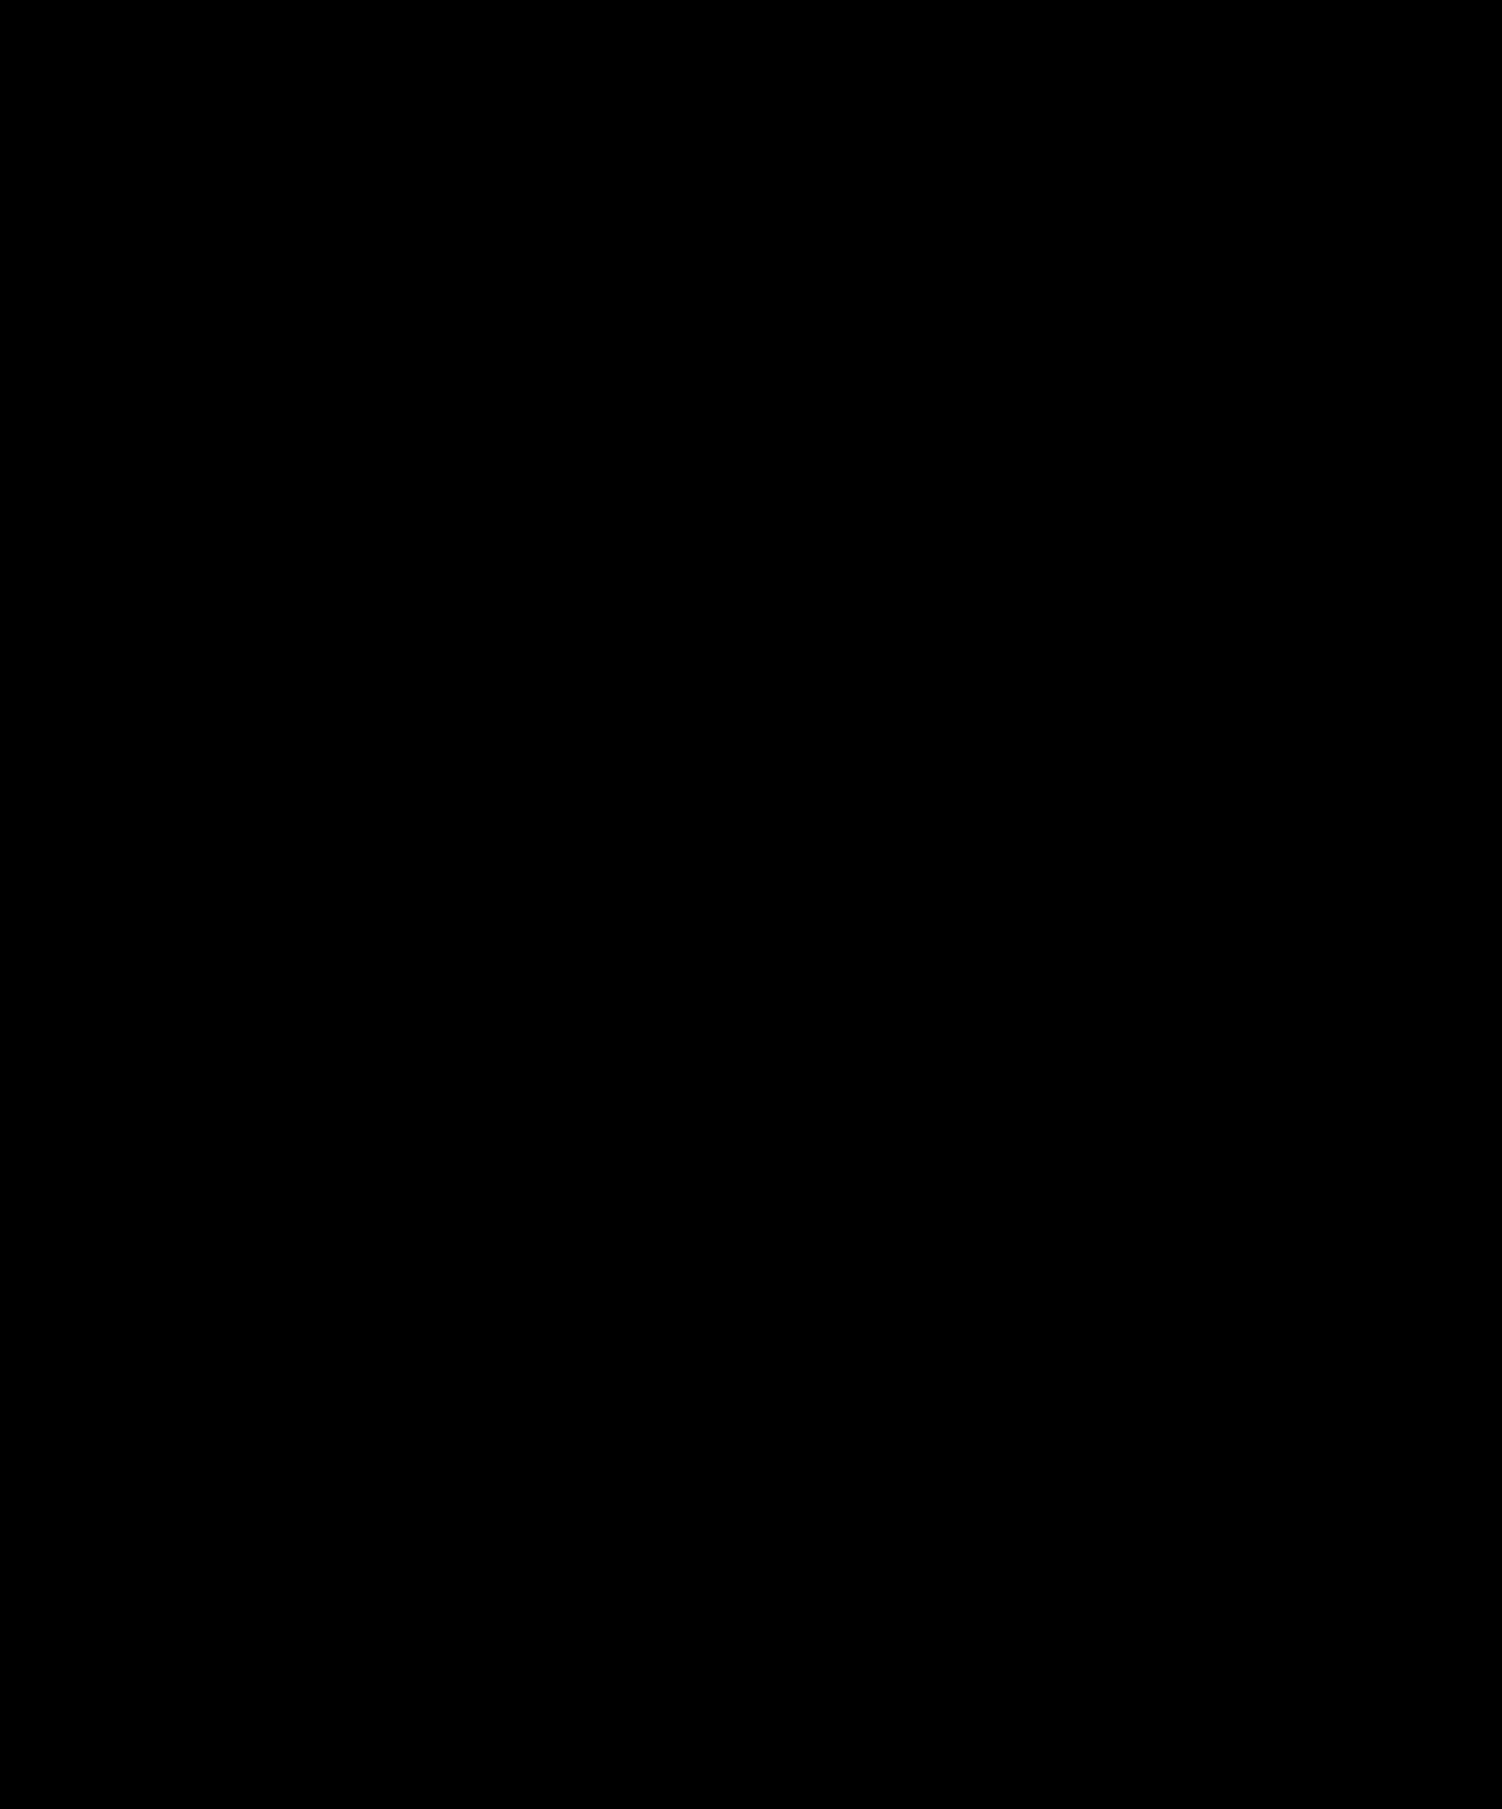 Black Fleur de Lis Vector Clip Art